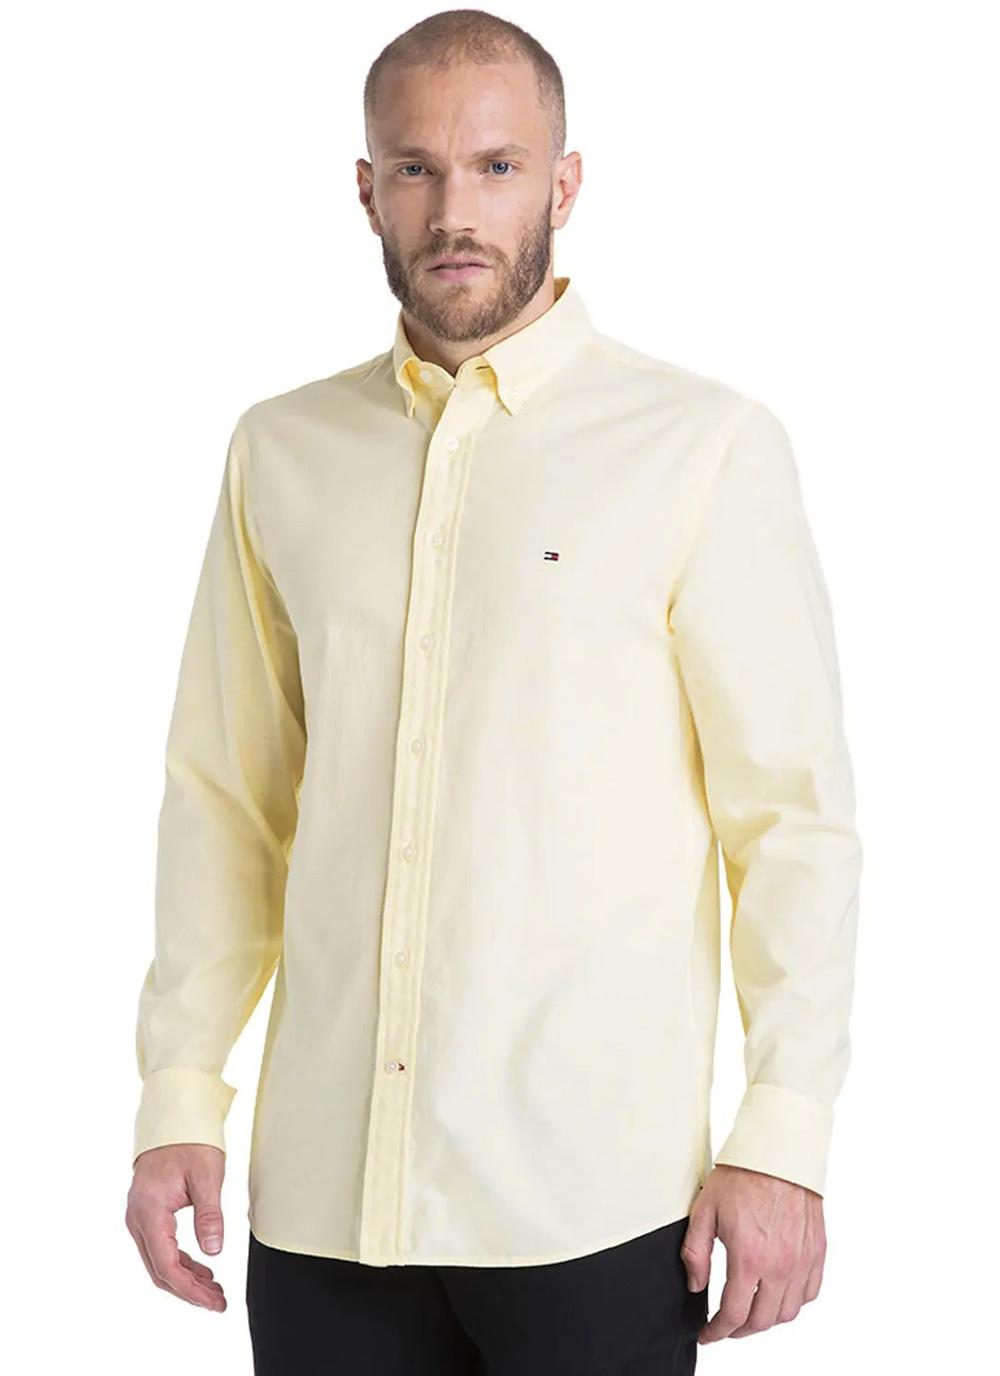 Camisa Tommy Hilfiger Masculina Regular Fit Cotton Oxford Amarelo